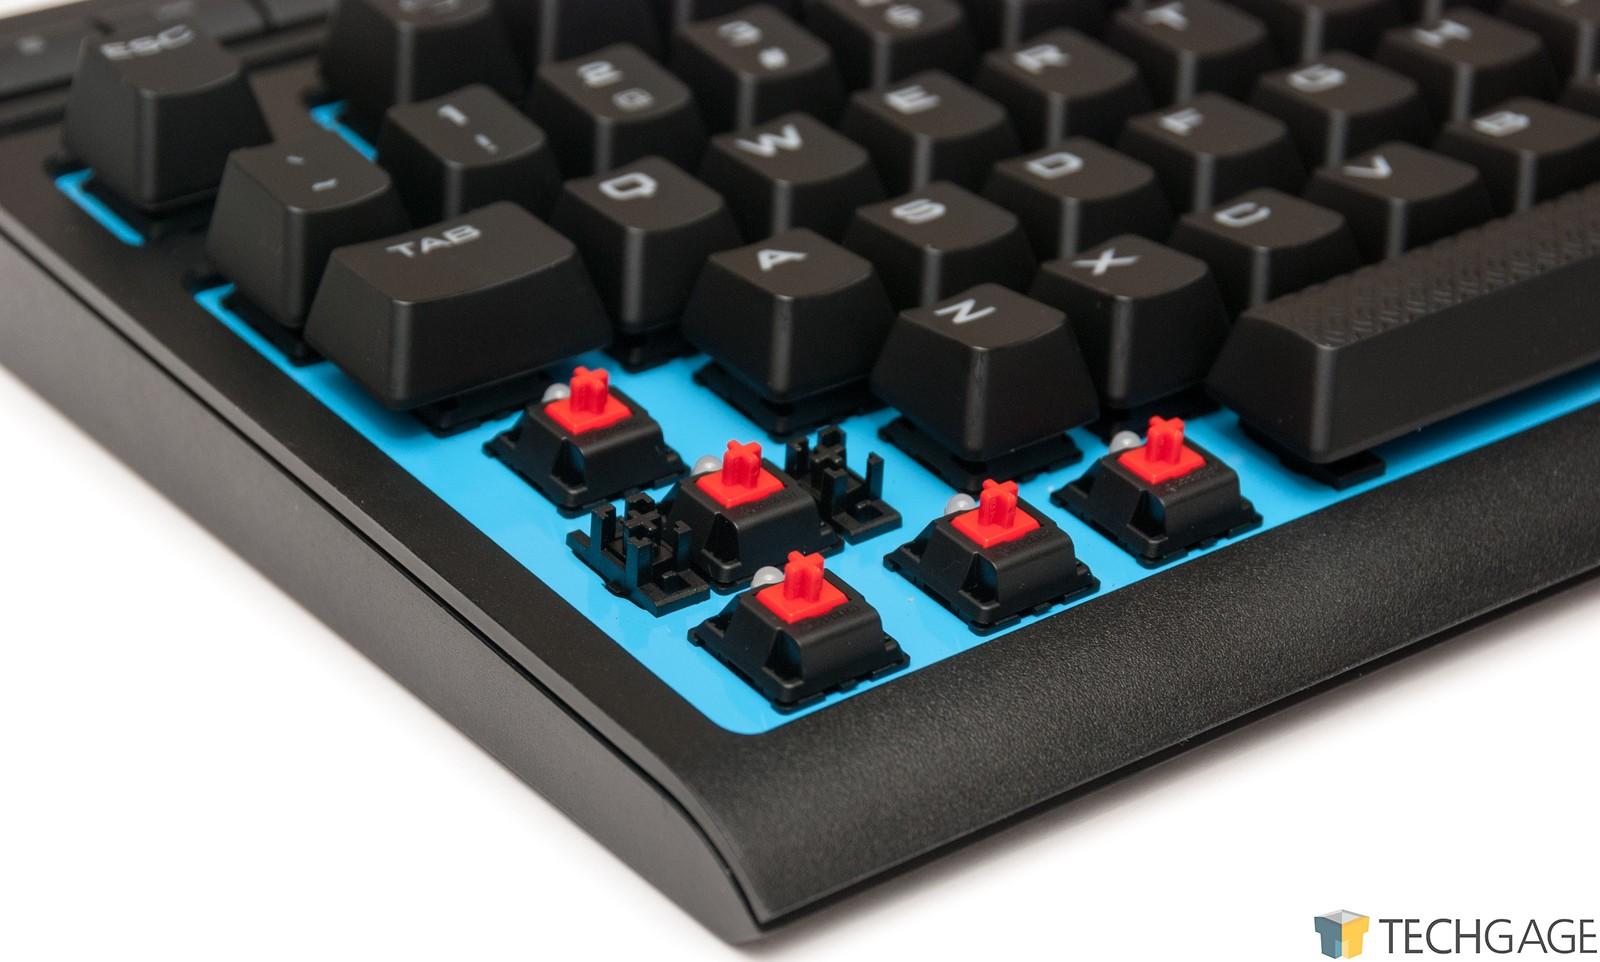 afca4aa6ec1 A Look At Corsair's K63 Wireless Keyboard, Dark Core Wireless Mouse ...